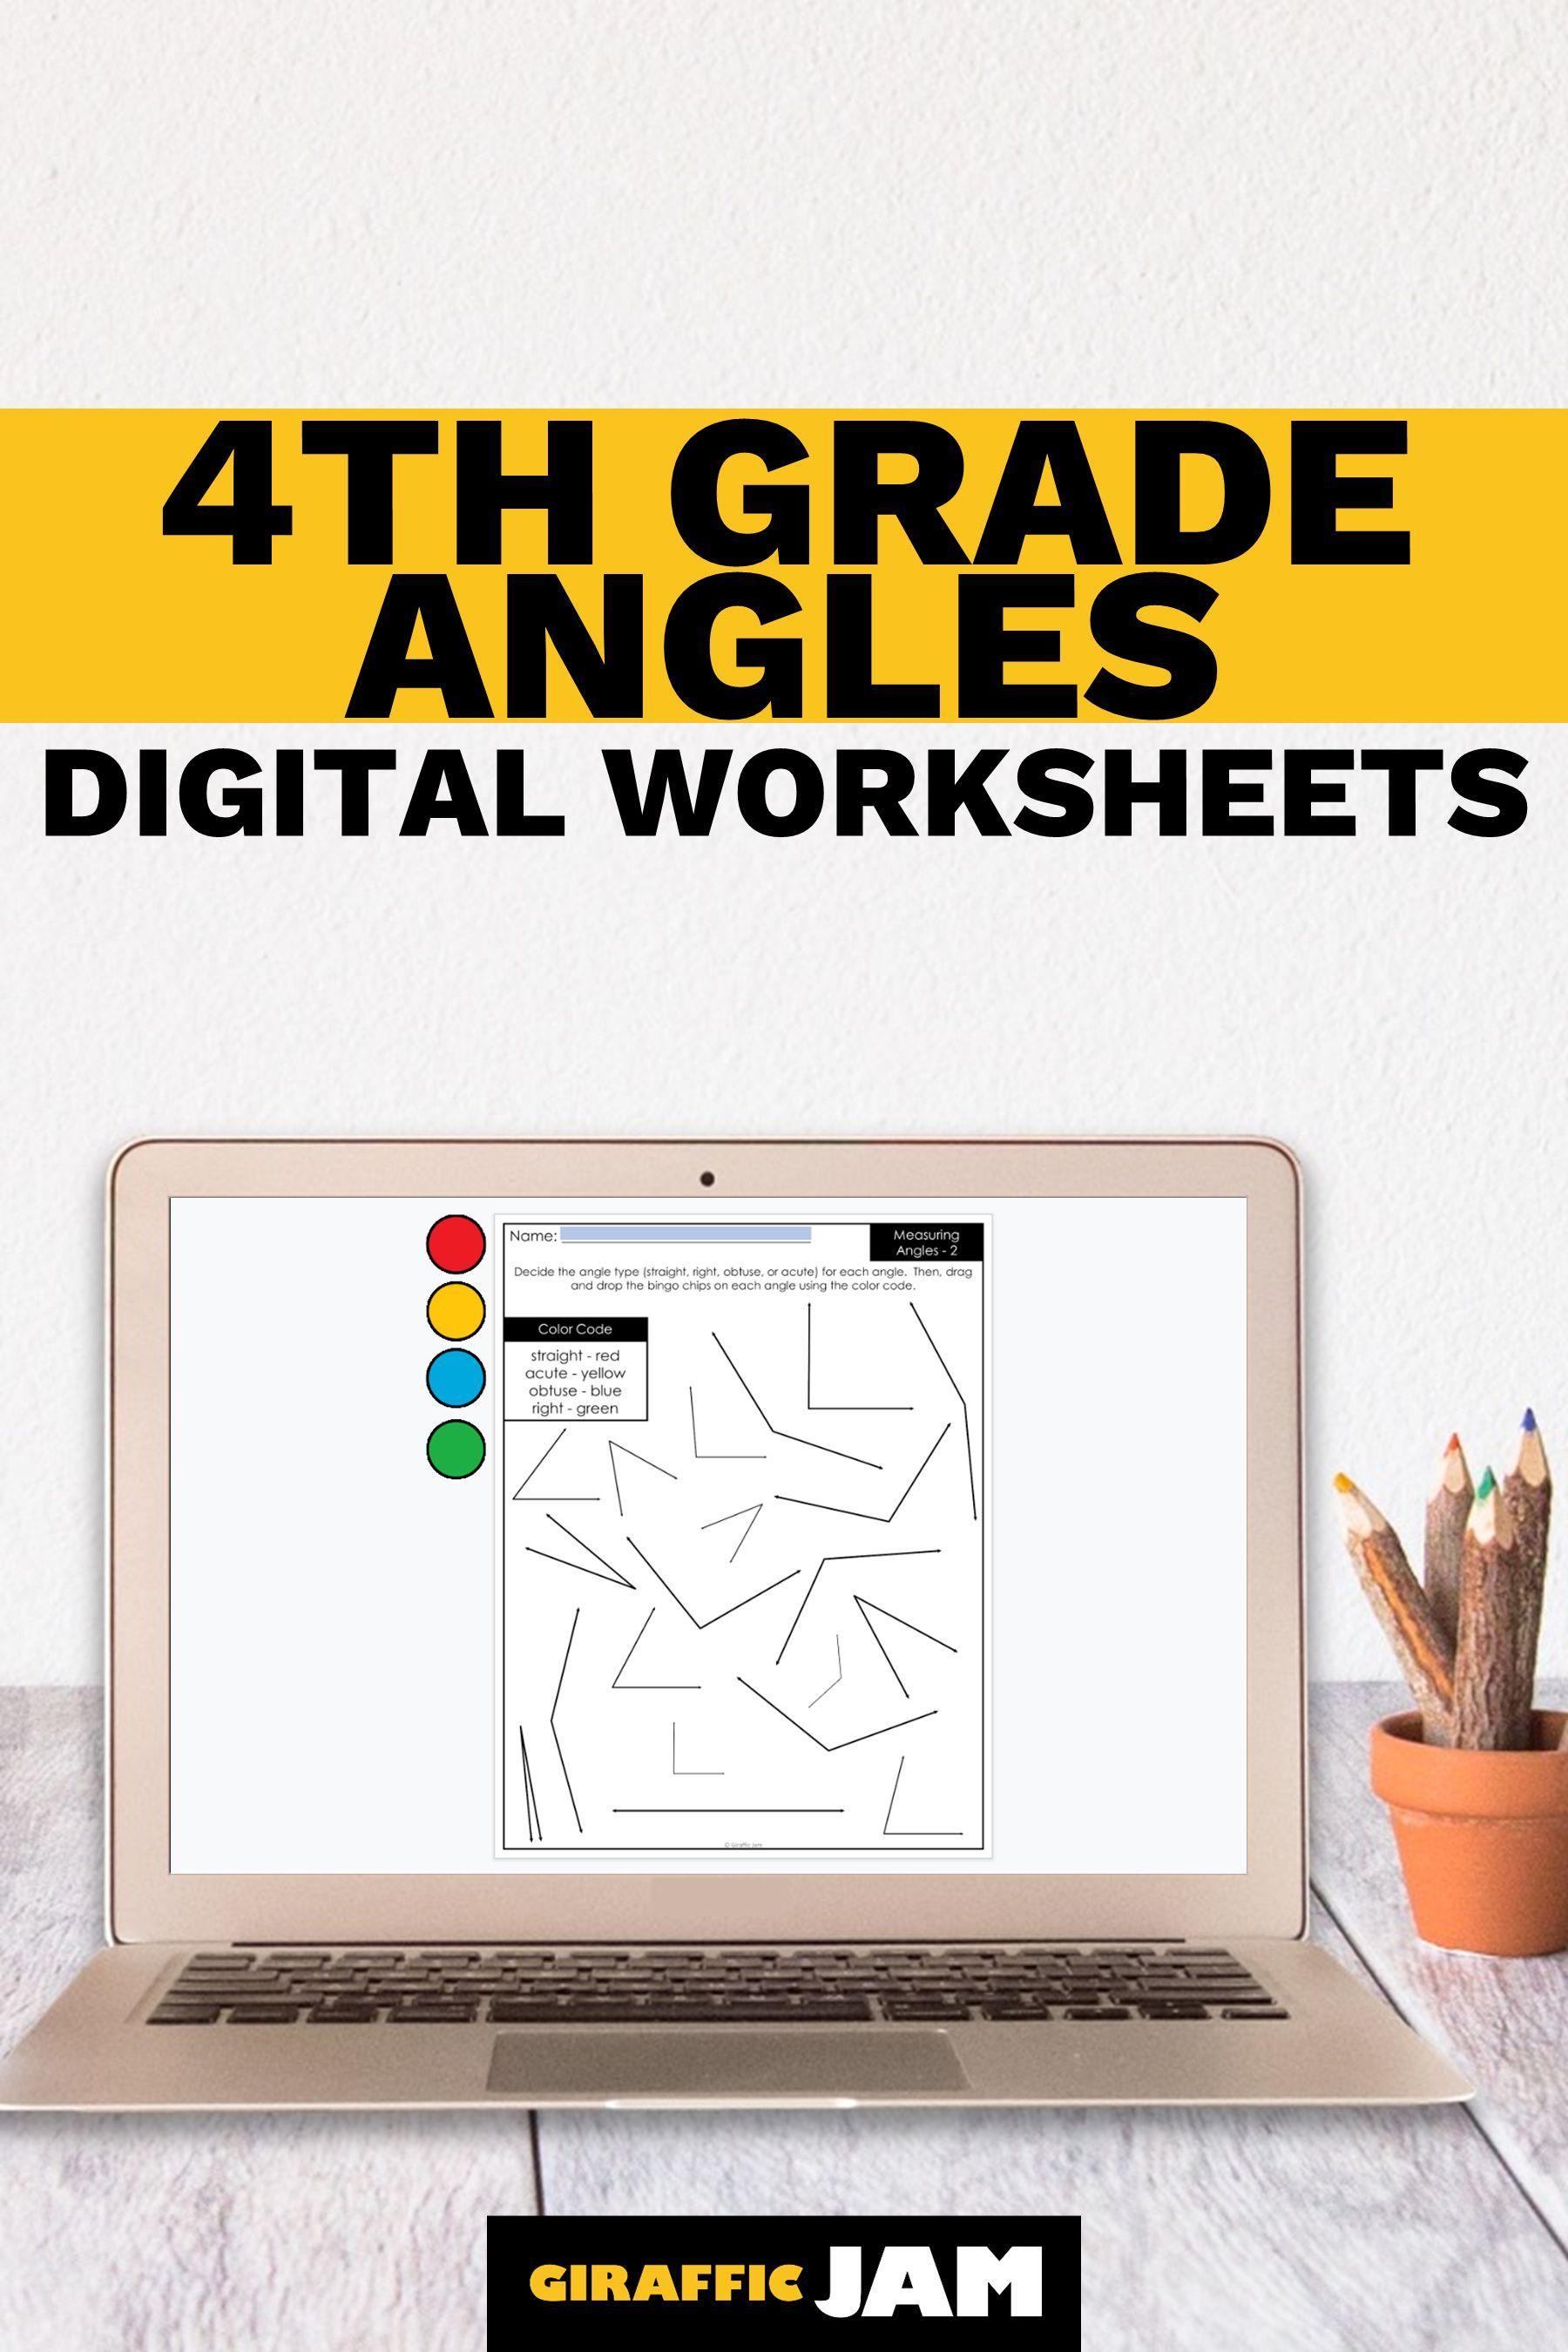 4th Grade Measurement Measurement Worksheets Angles Measuring Angles Digital Works Google Classroom Activities Measurement Worksheets Google Classroom [ 2700 x 1800 Pixel ]